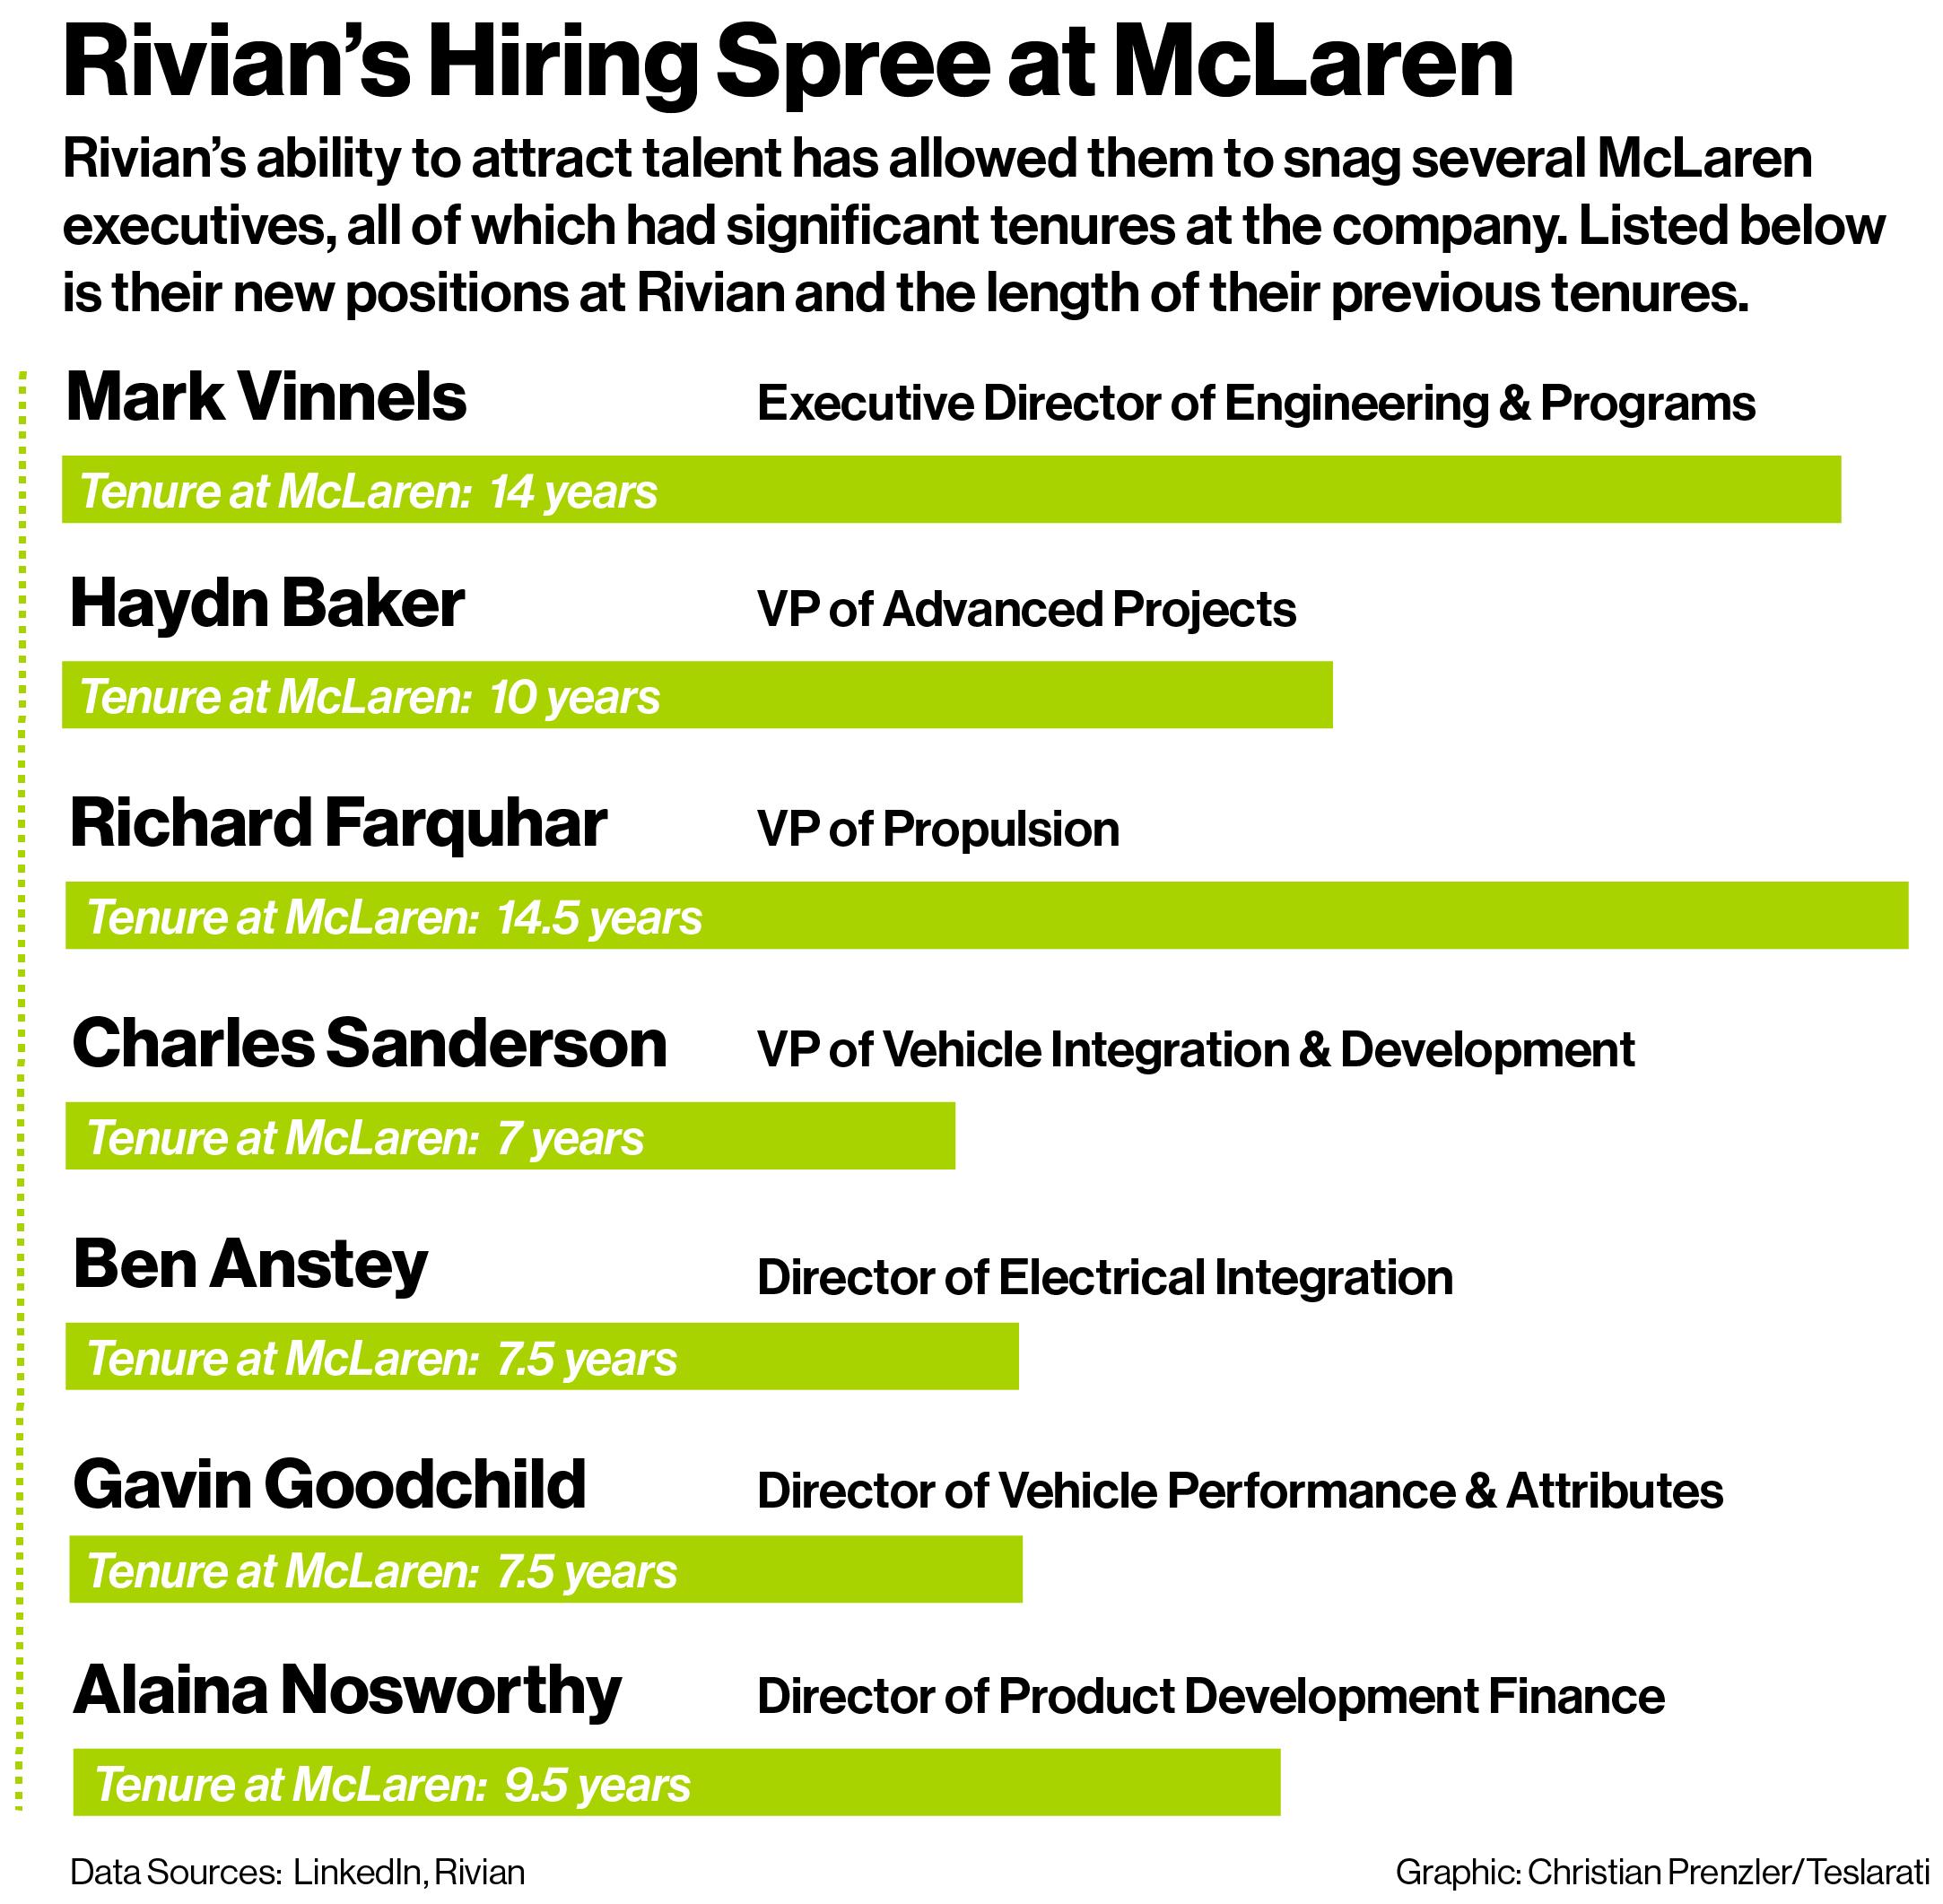 Rivian's Hiring Spree Teslarati Graphic@2x